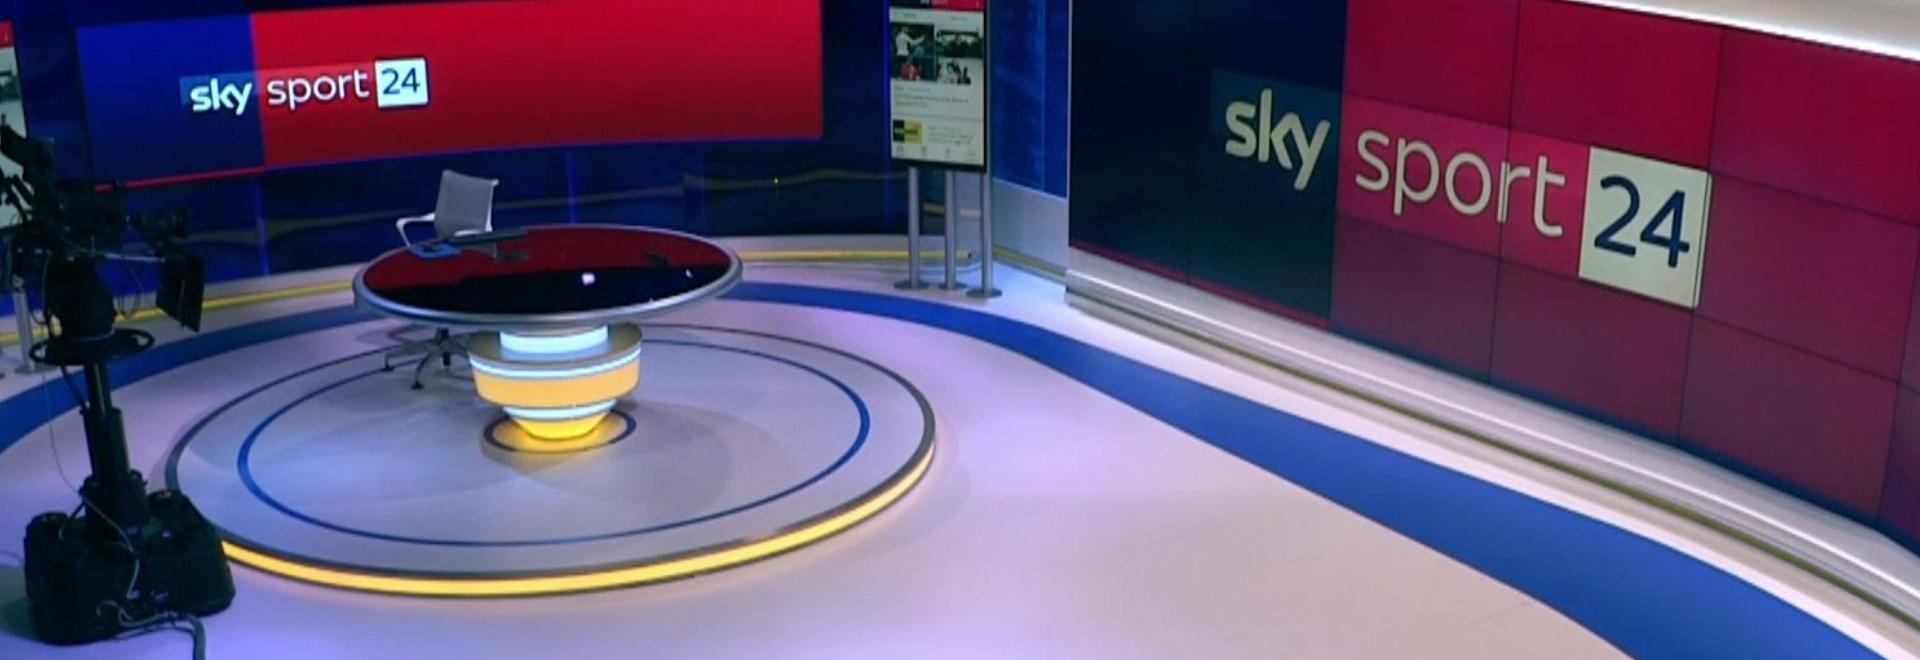 Sky Sport 24 Piano B